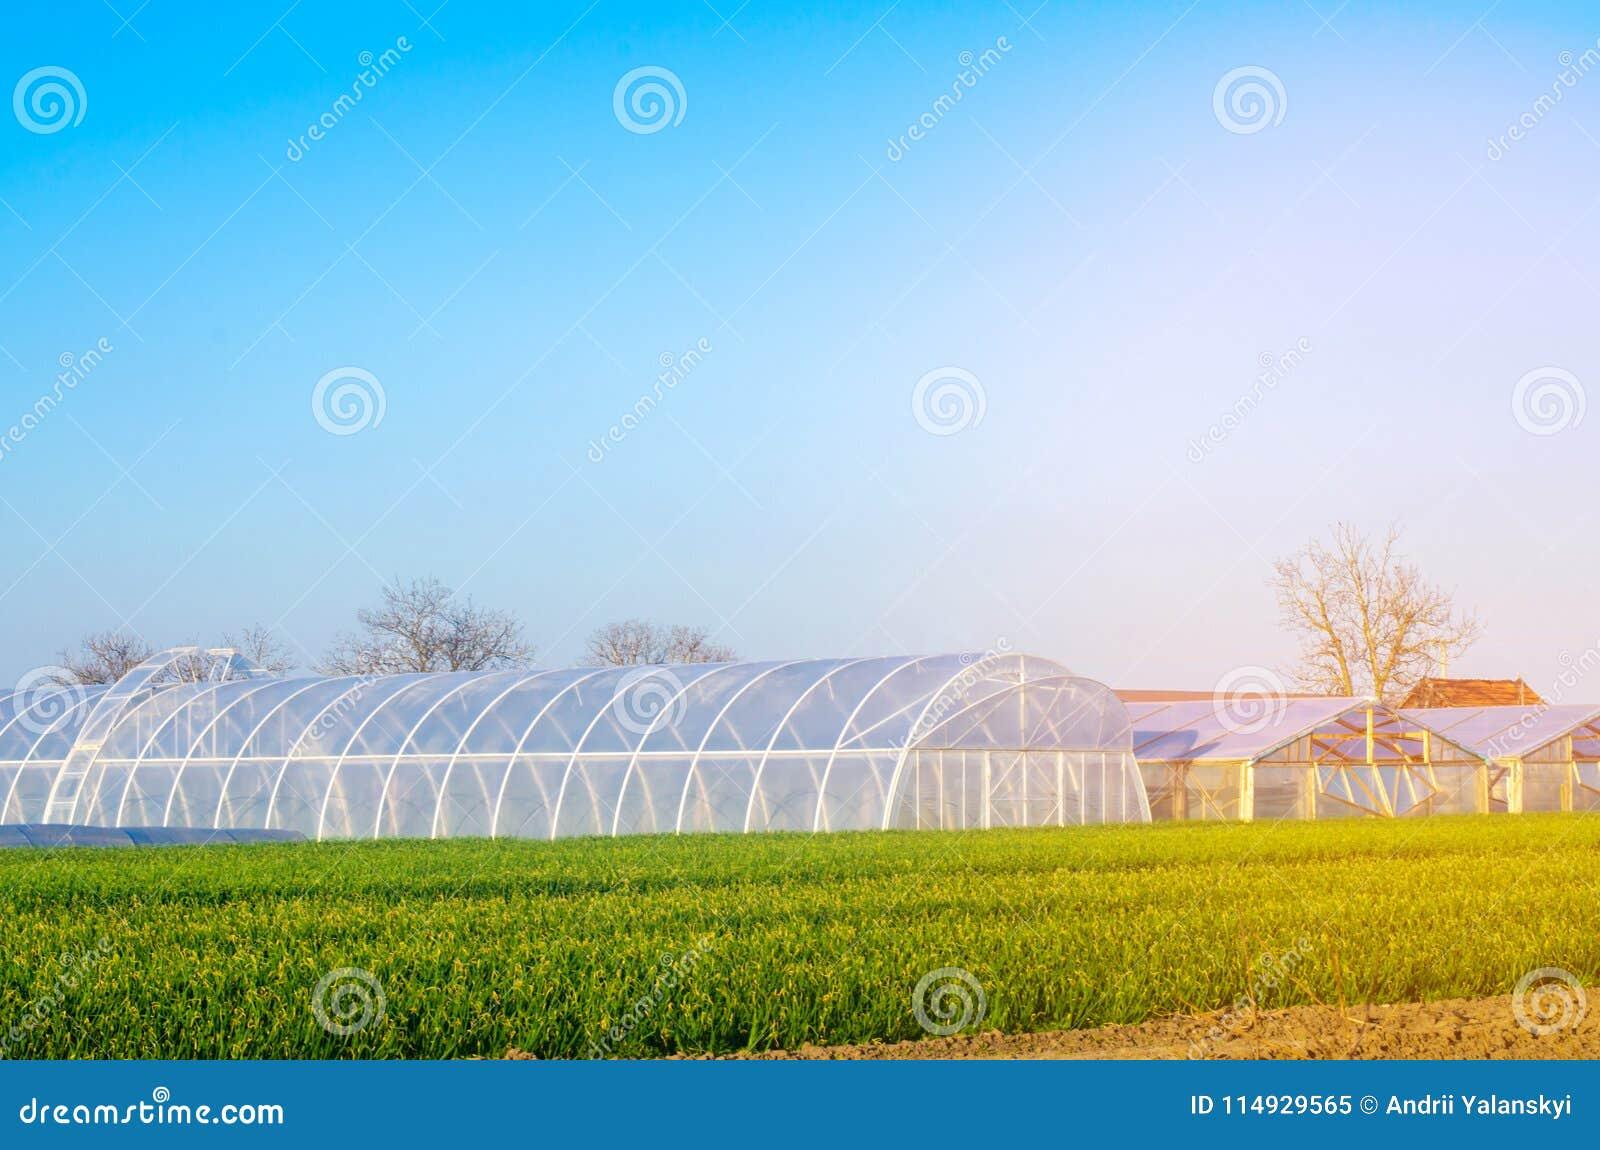 Estufas no campo para plântulas das colheitas, frutos, vegetais, emprestando aos fazendeiros, terras, agricultura, áreas rurais,